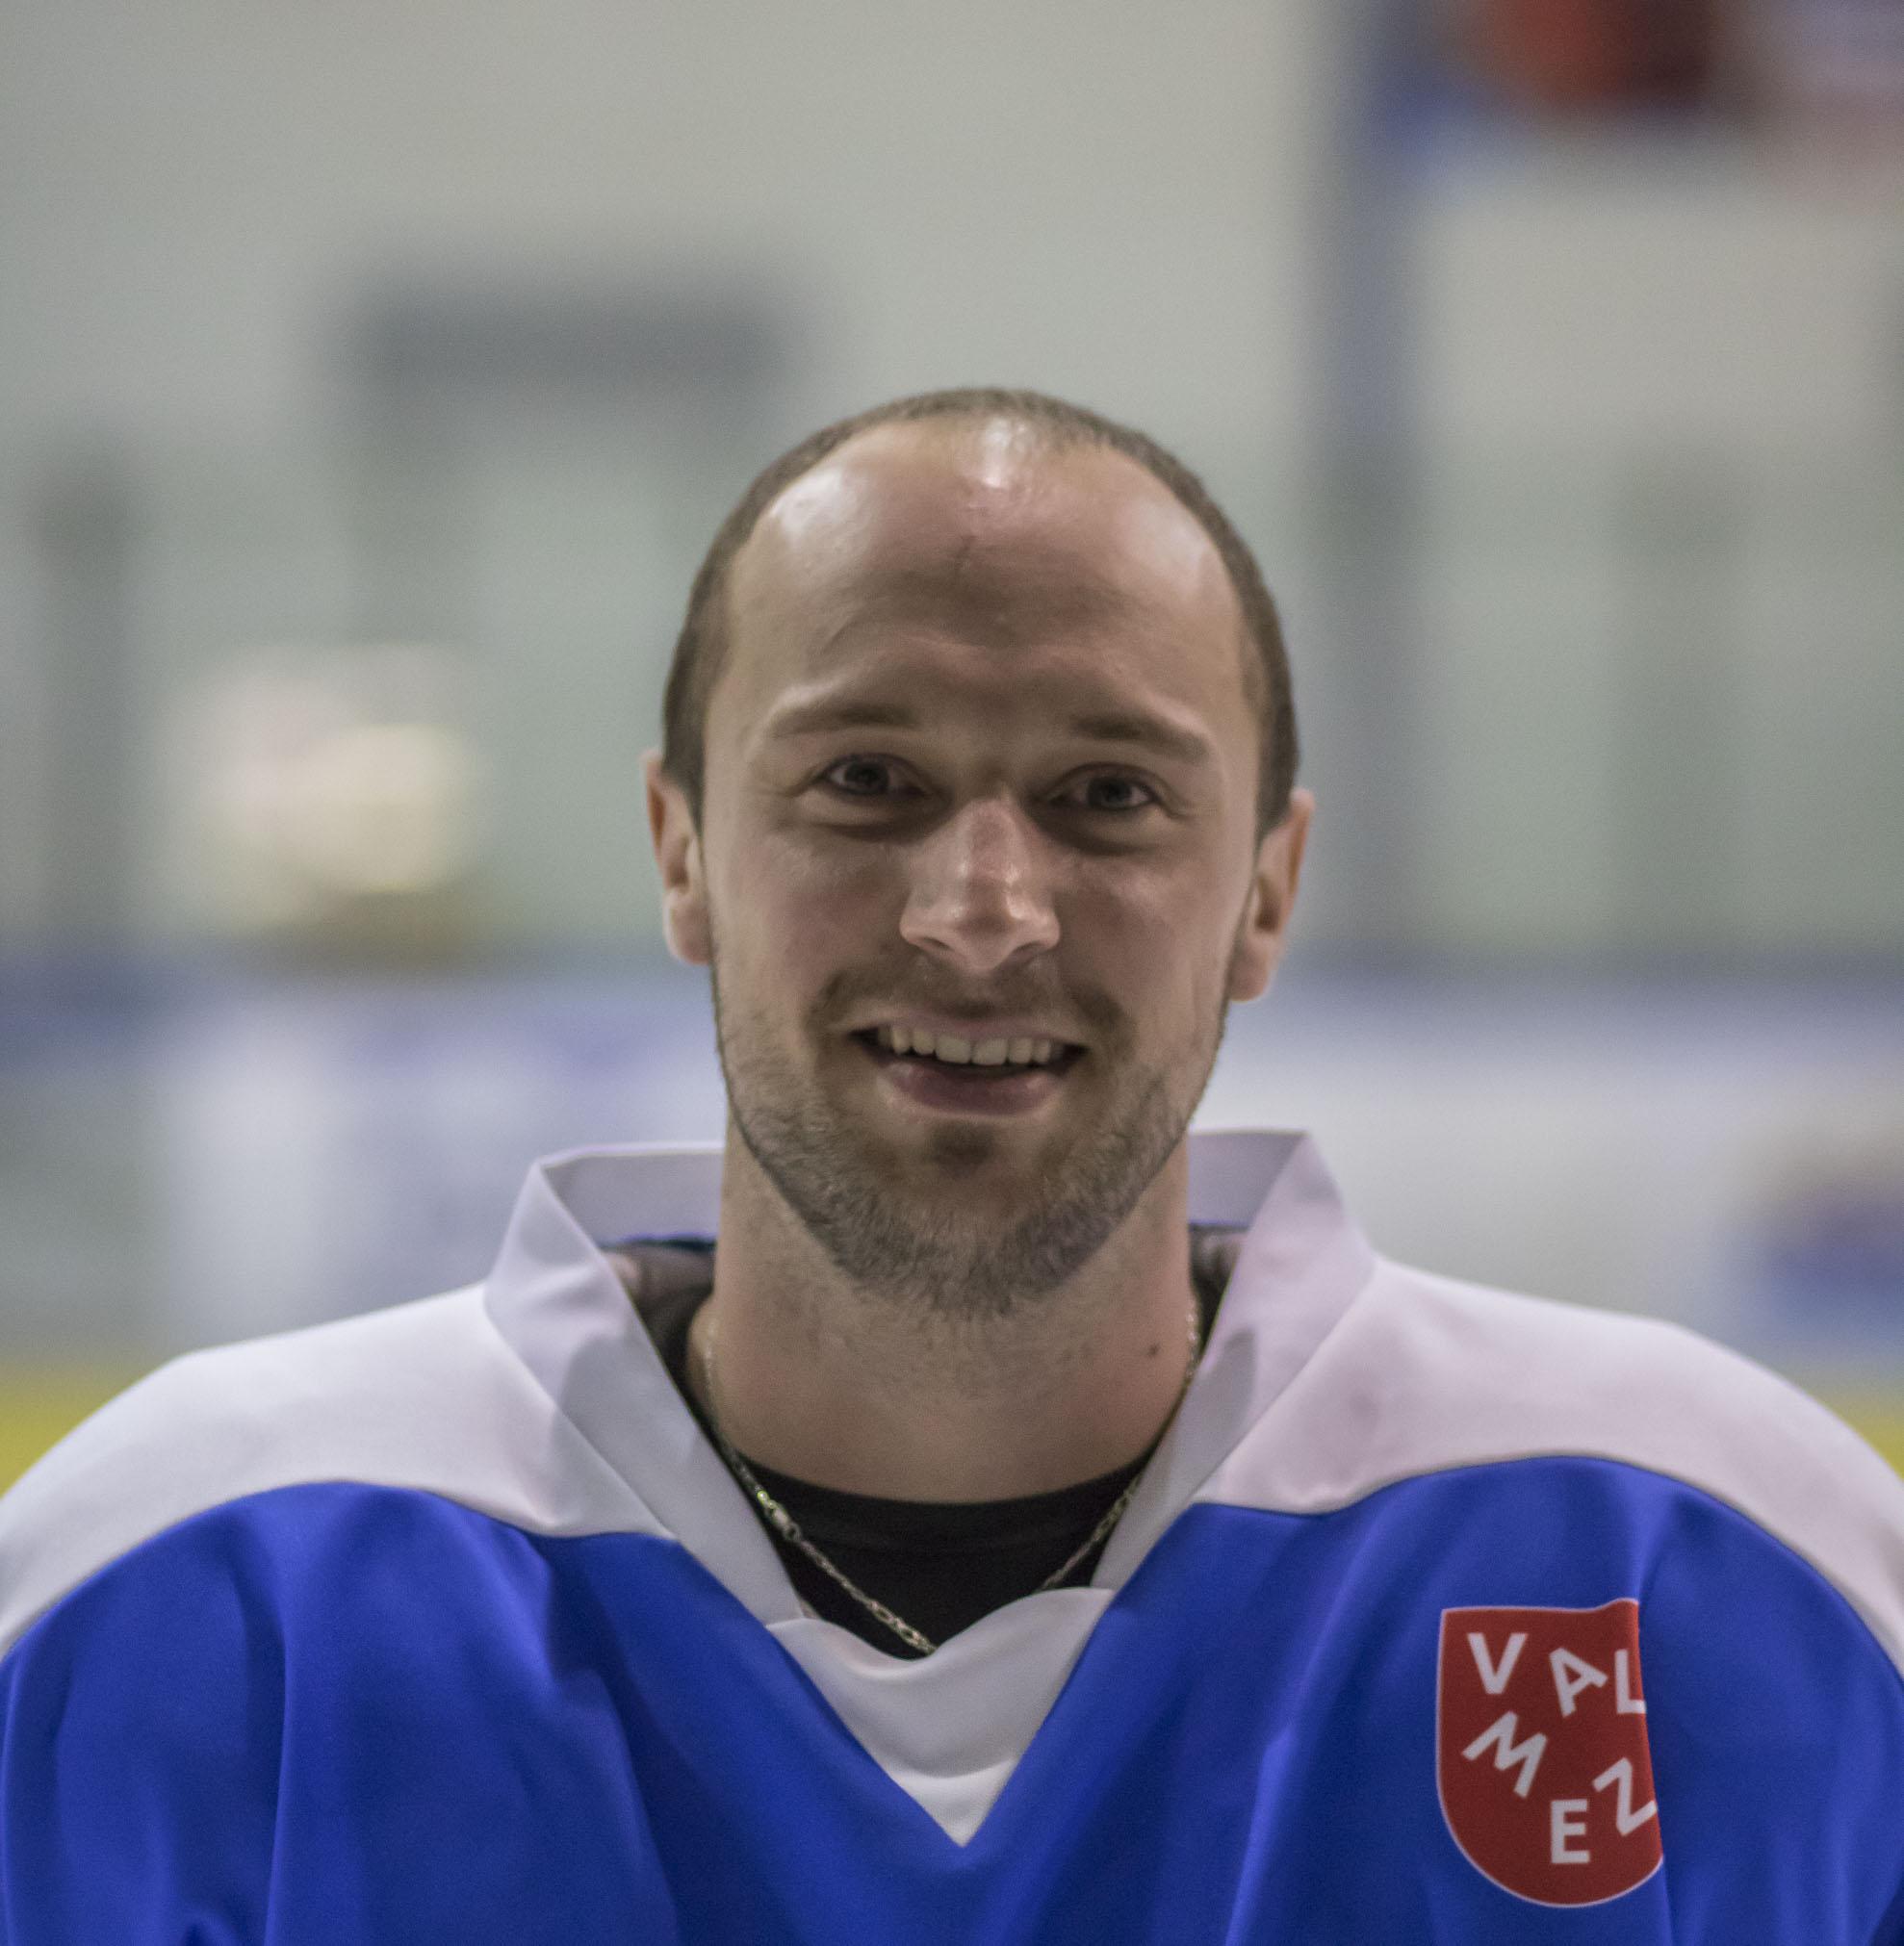 Josef Danìk #93